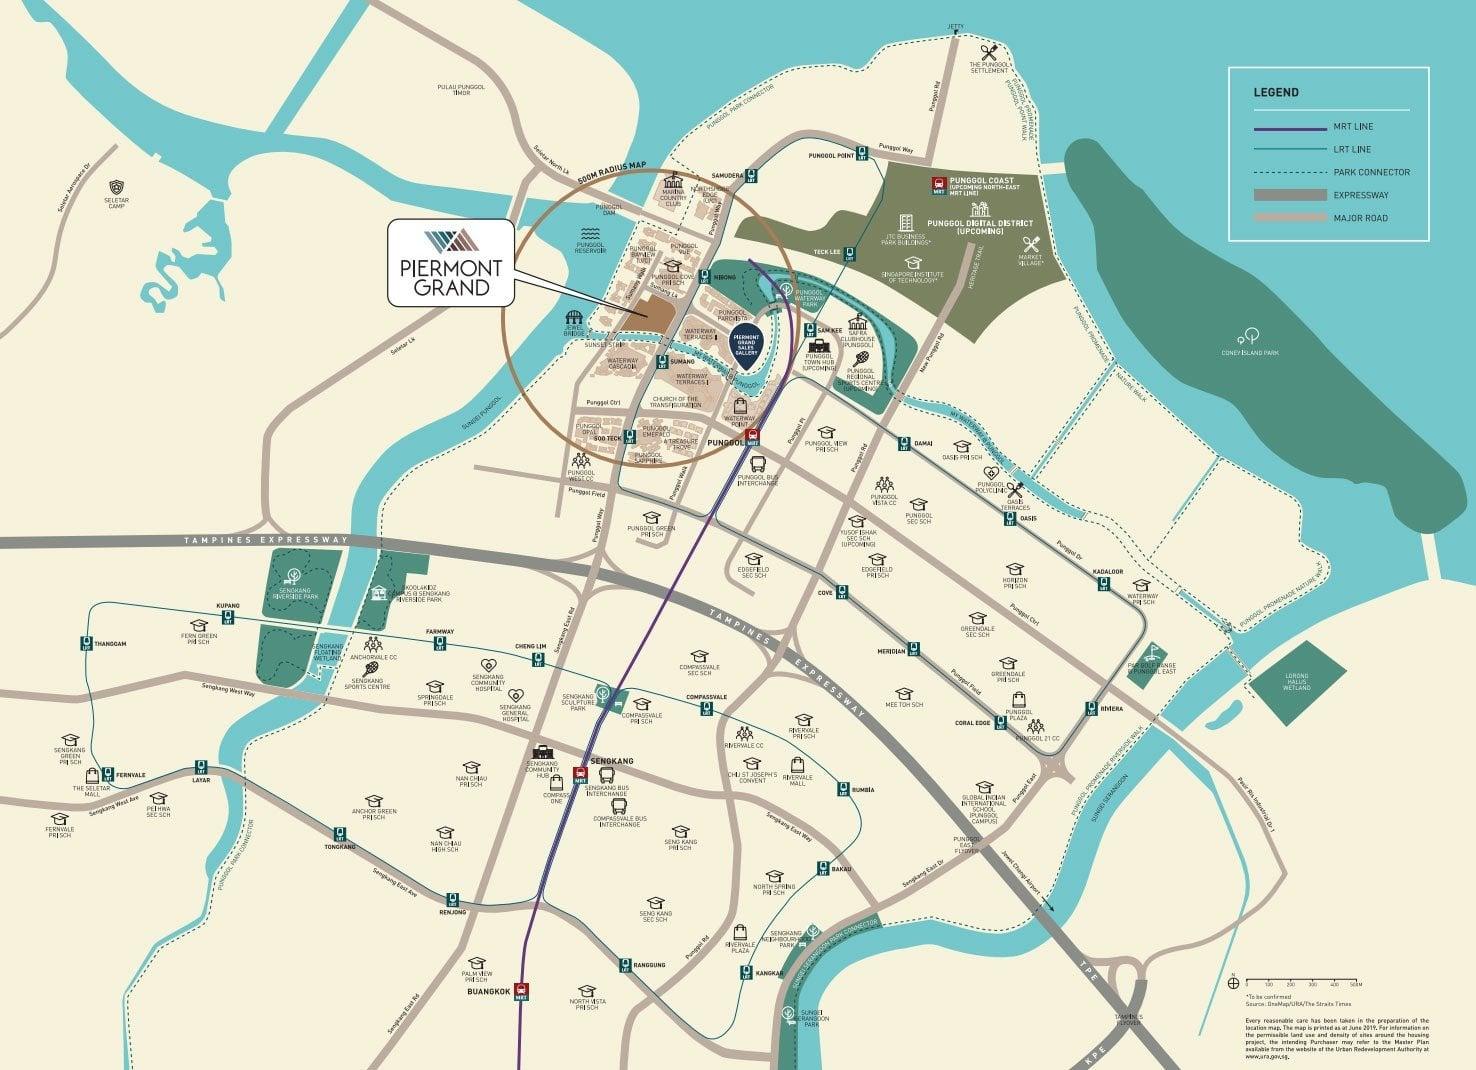 Piermont-Grand-Sumang-Walk-Location